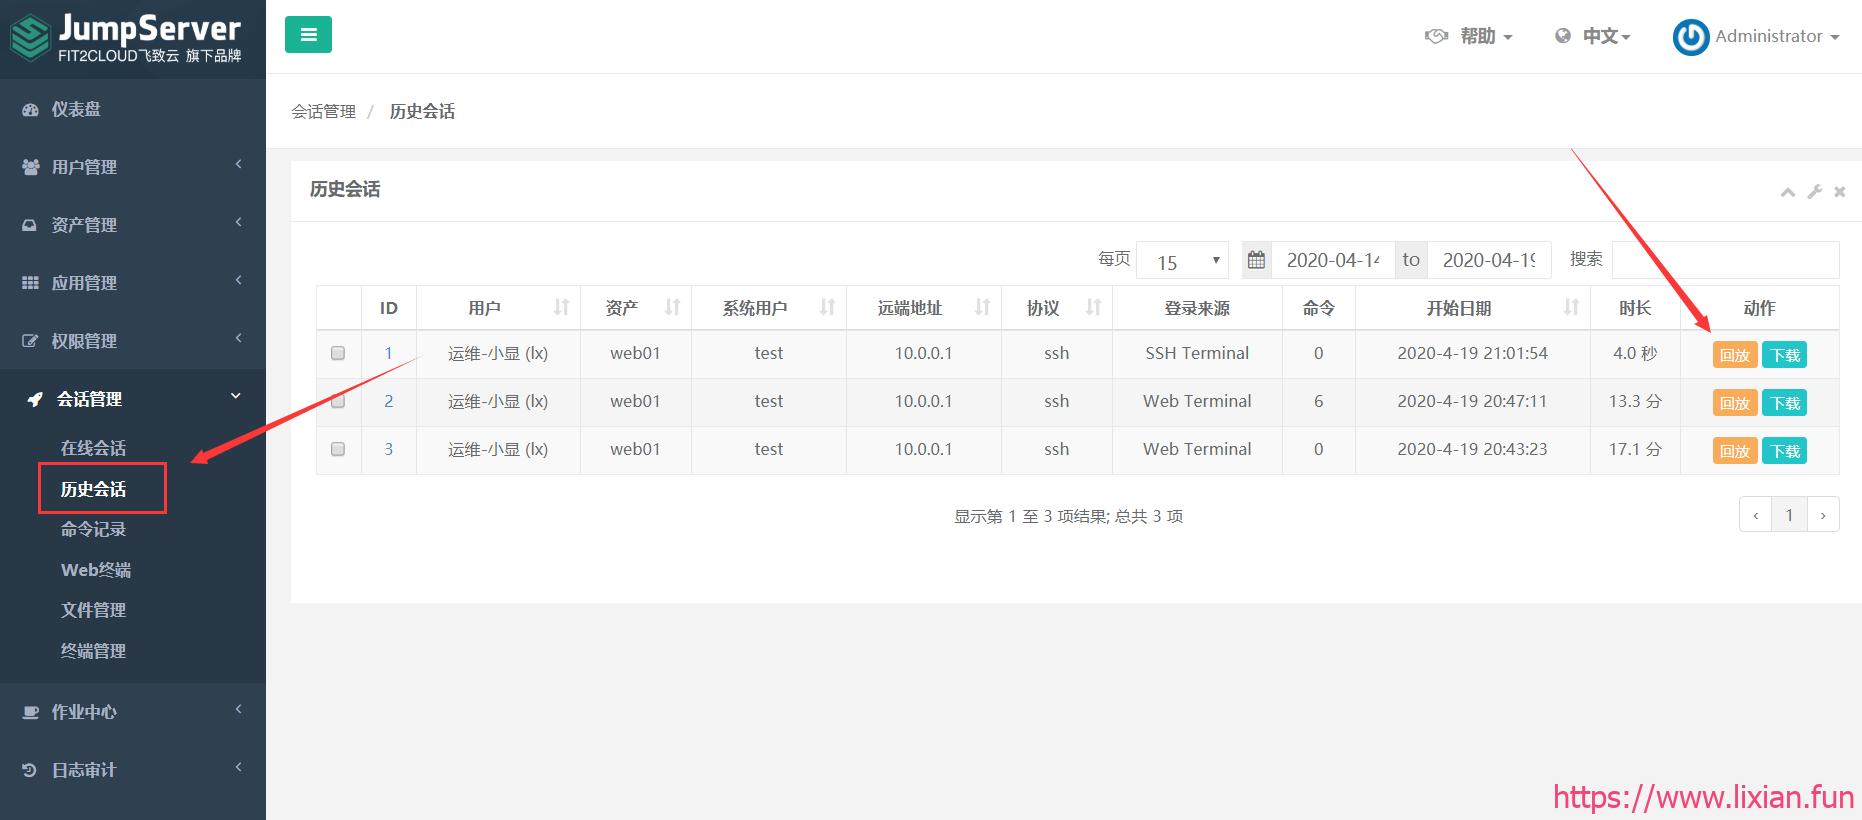 Docker部署搭建企业级Jumpserver堡垒机(应用篇)